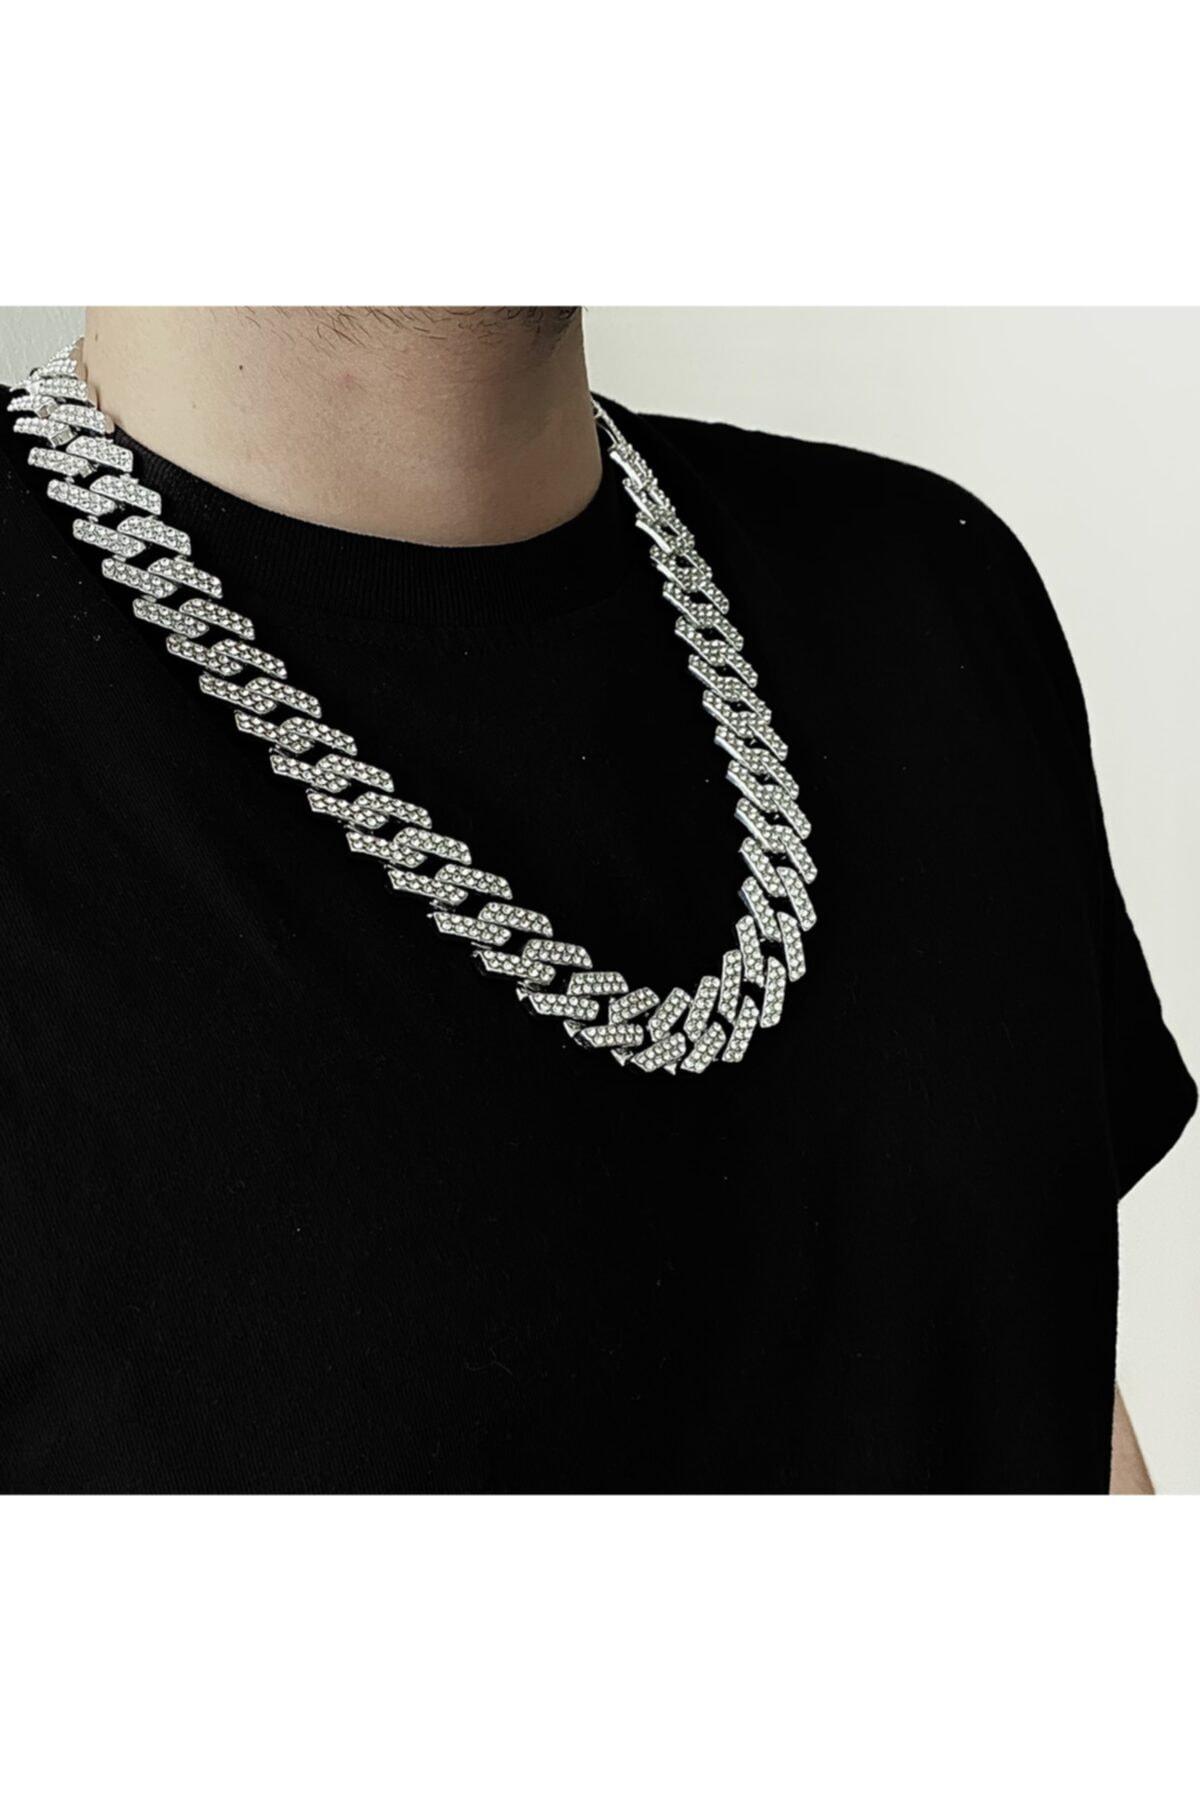 34528 Chain Silver Prong Chain Seti 2